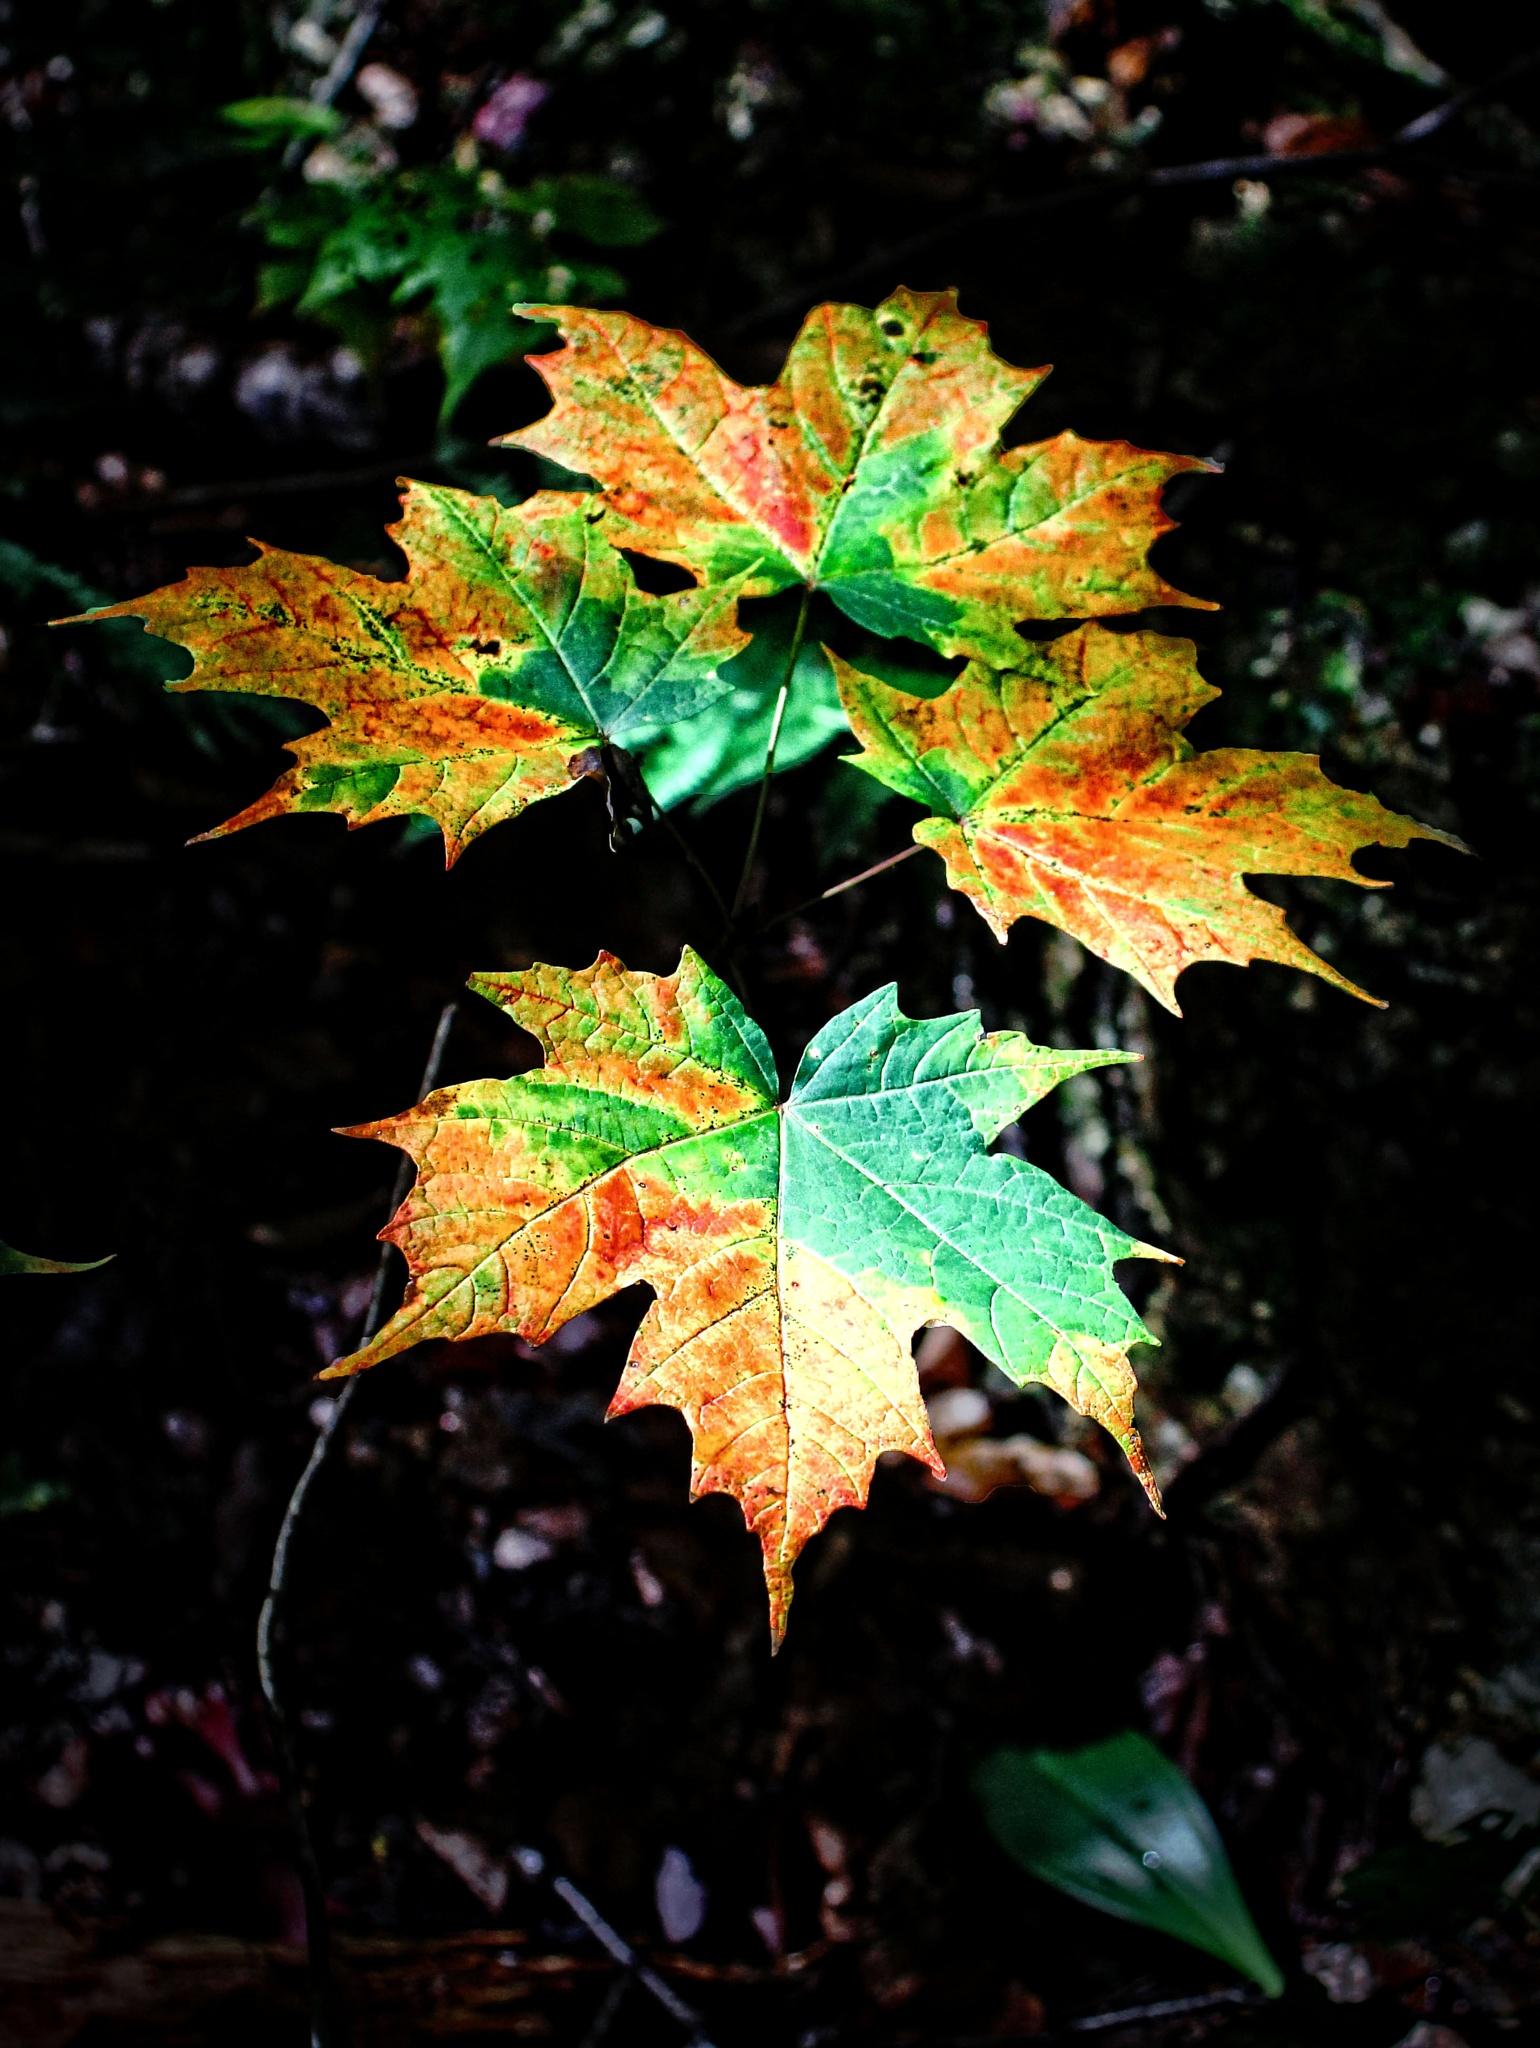 Autumn Leaves by John Bork